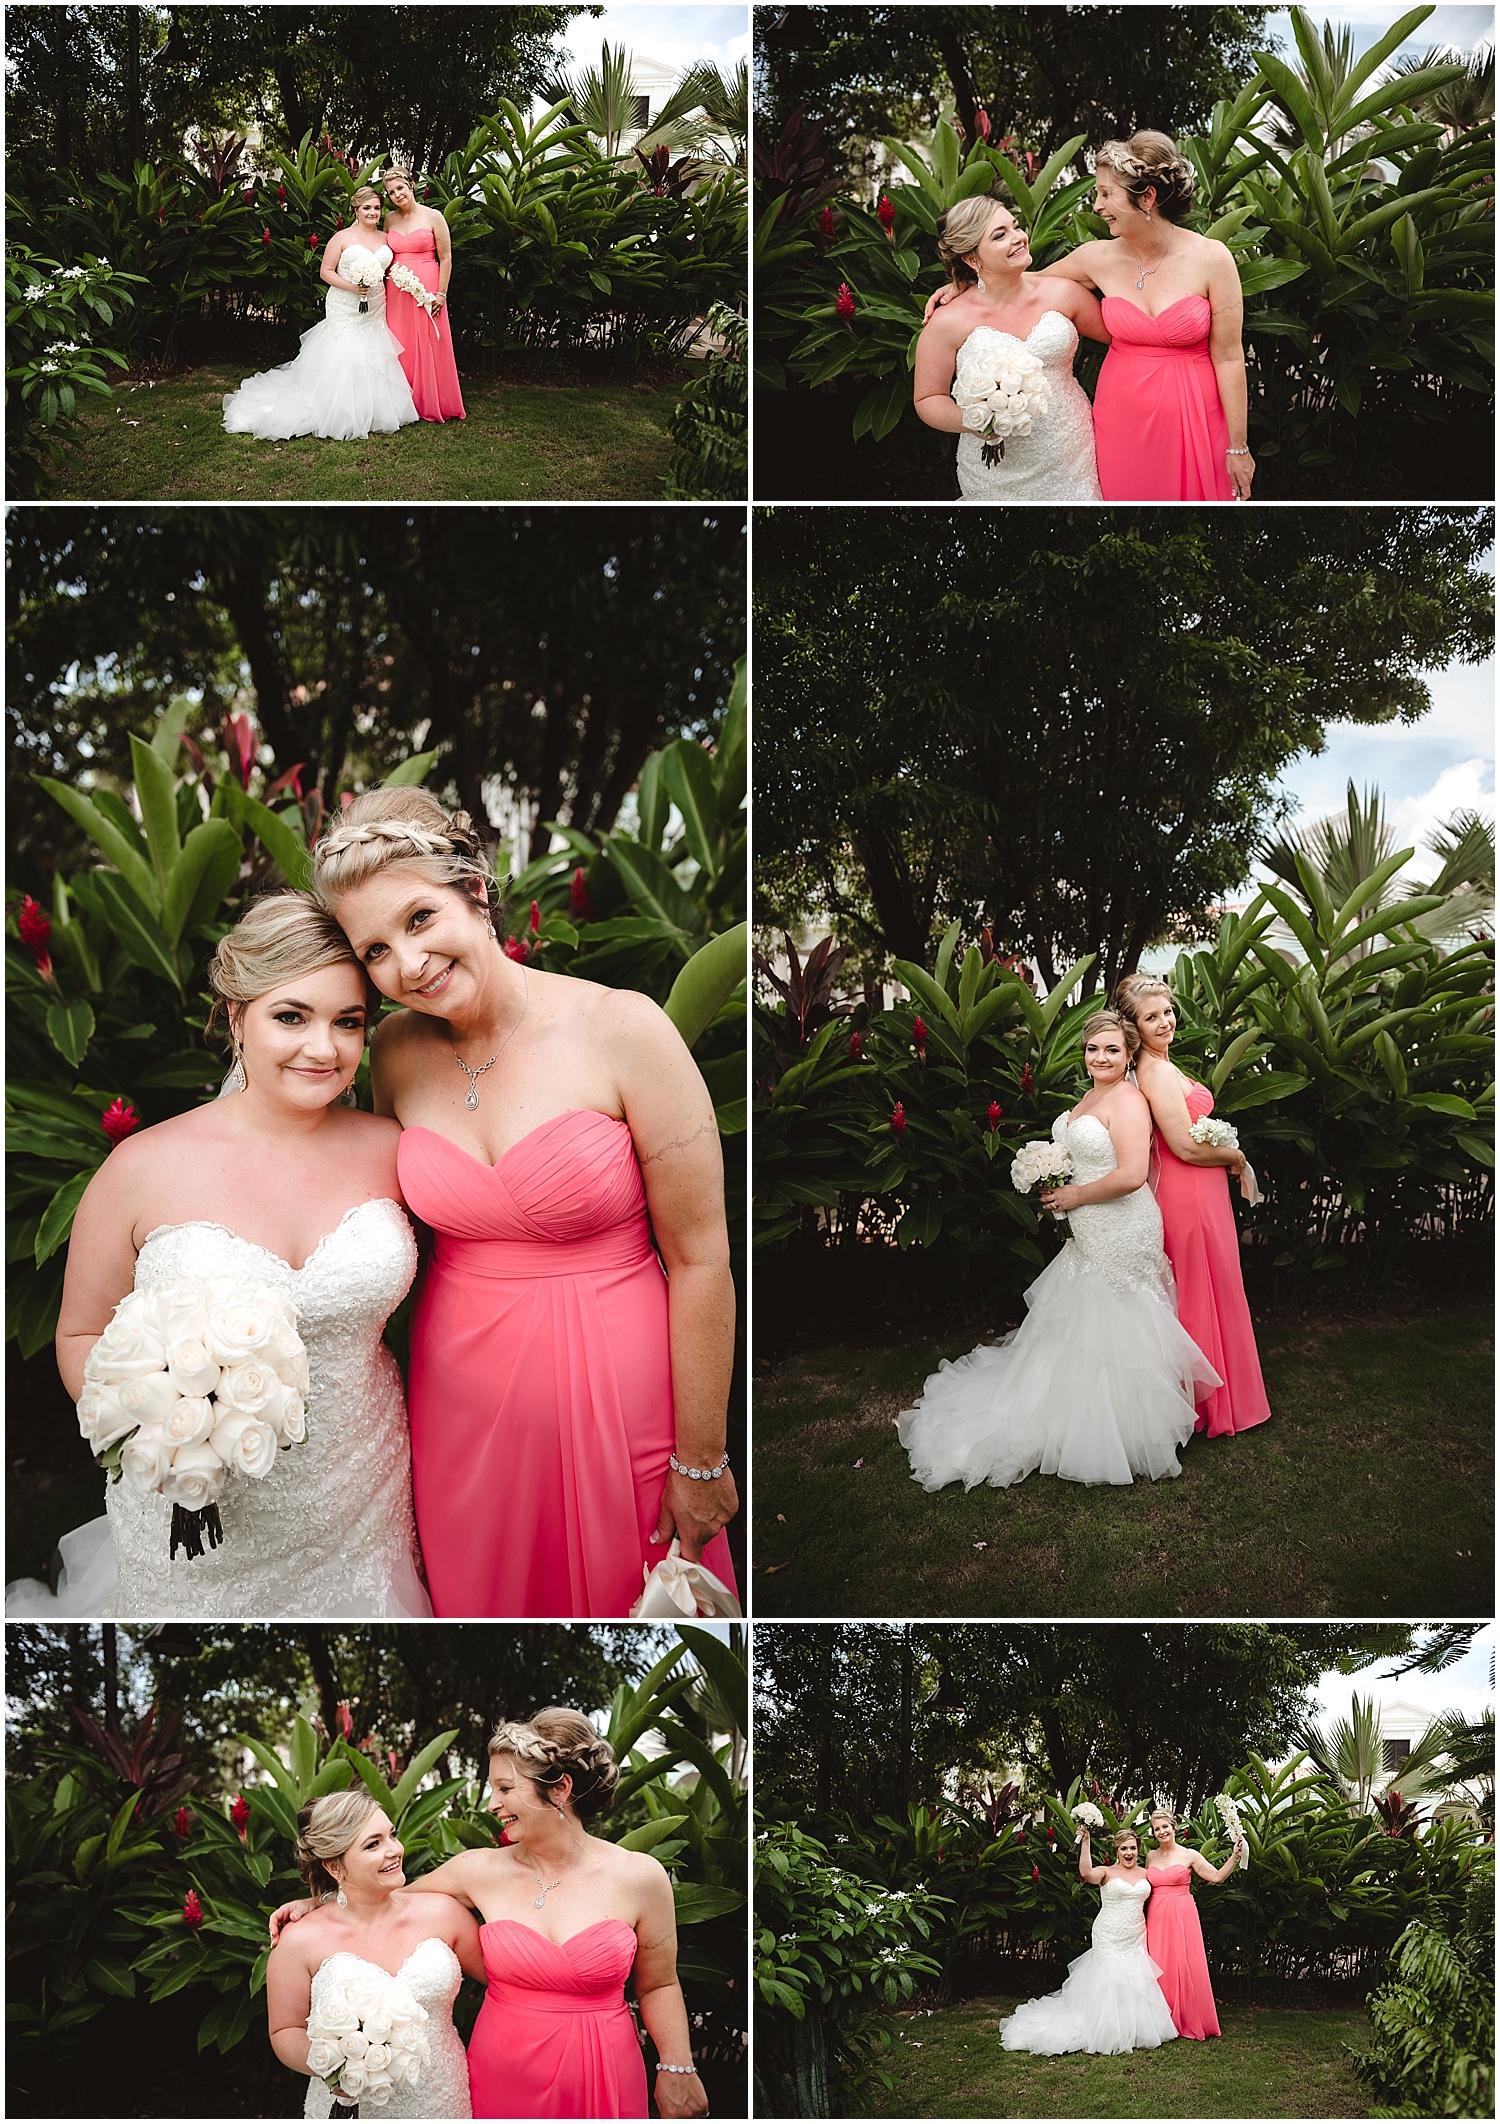 NEPA-Scranton-Sandals-Southcoast-wedding-engagement-photographer-in-Philadelphia-PA-Central-PA_0047.jpg